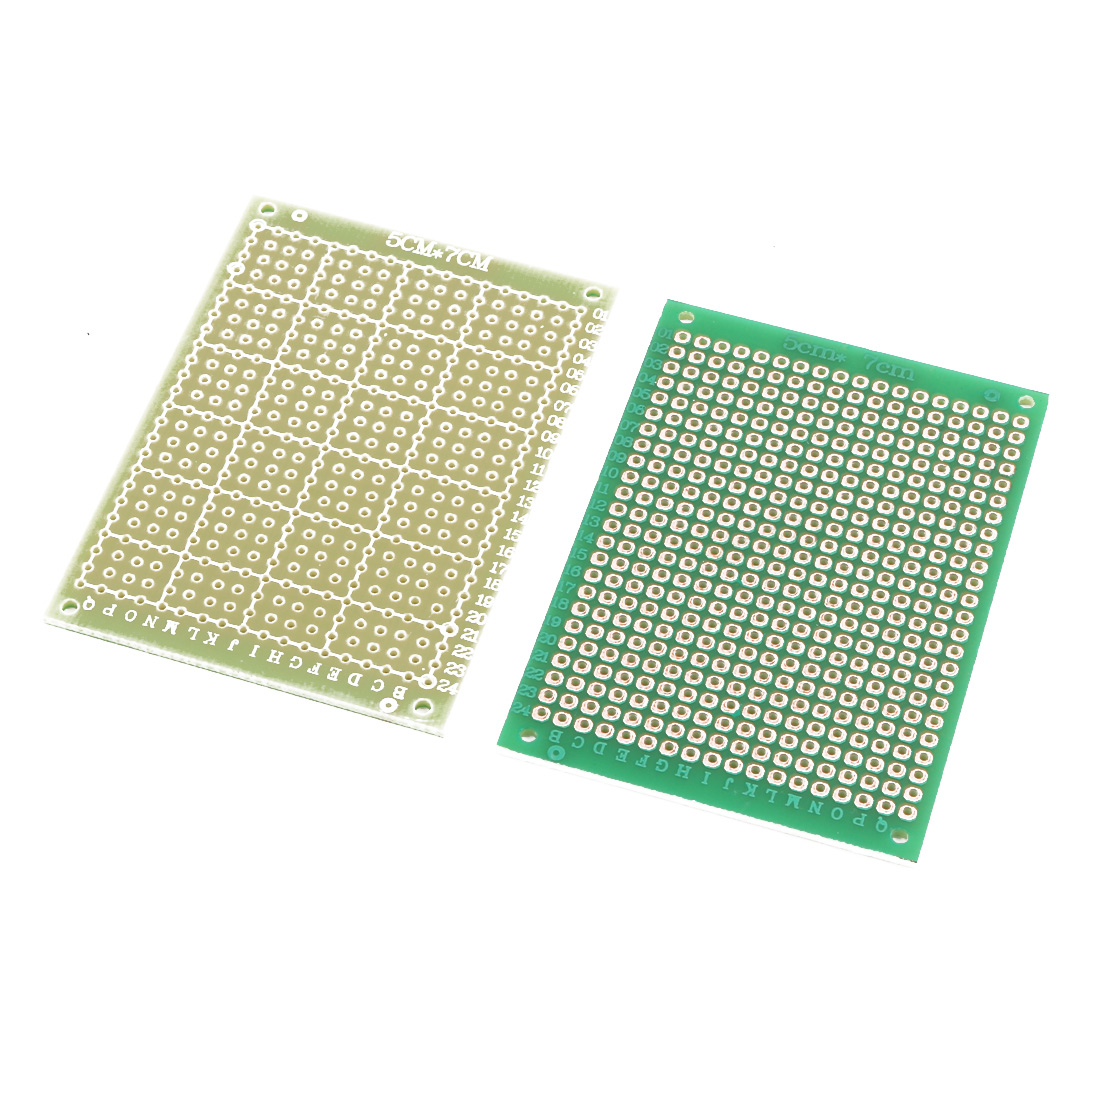 2Pcs Single-Side DIY Prototype Paper fr4 Universal PCB Board 5cm x 7cm